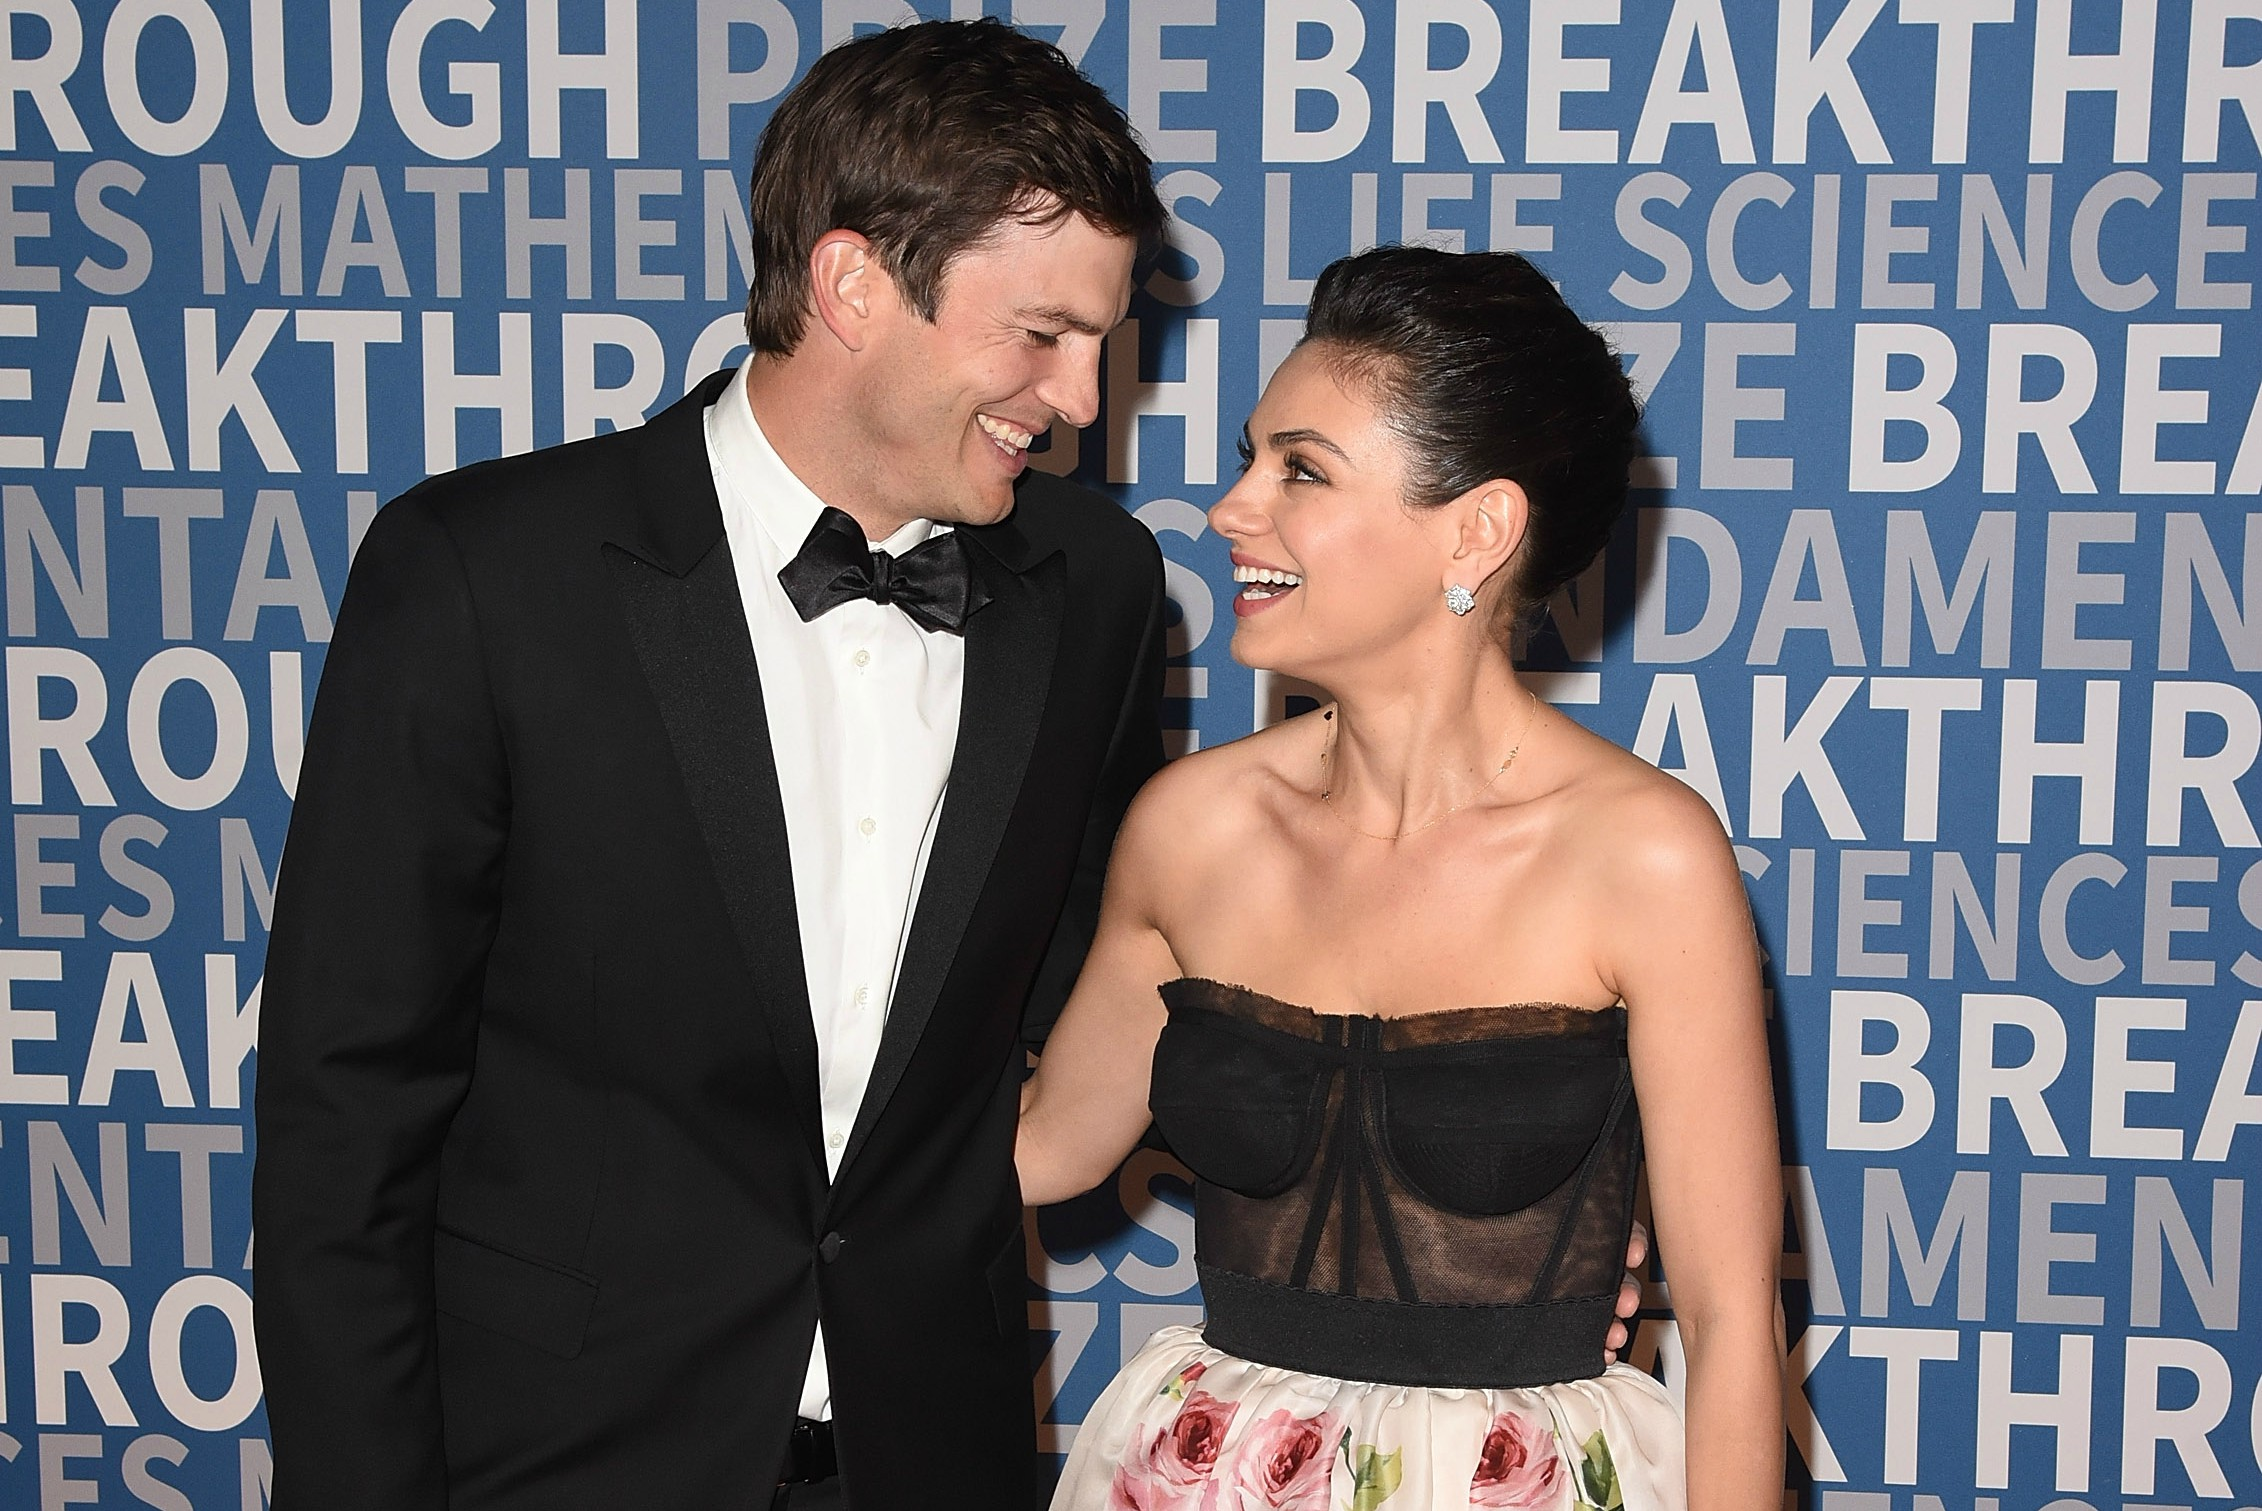 Mila Kunis and Ashton Kutcher at the 2018 Breakthrough Prize Ceremony